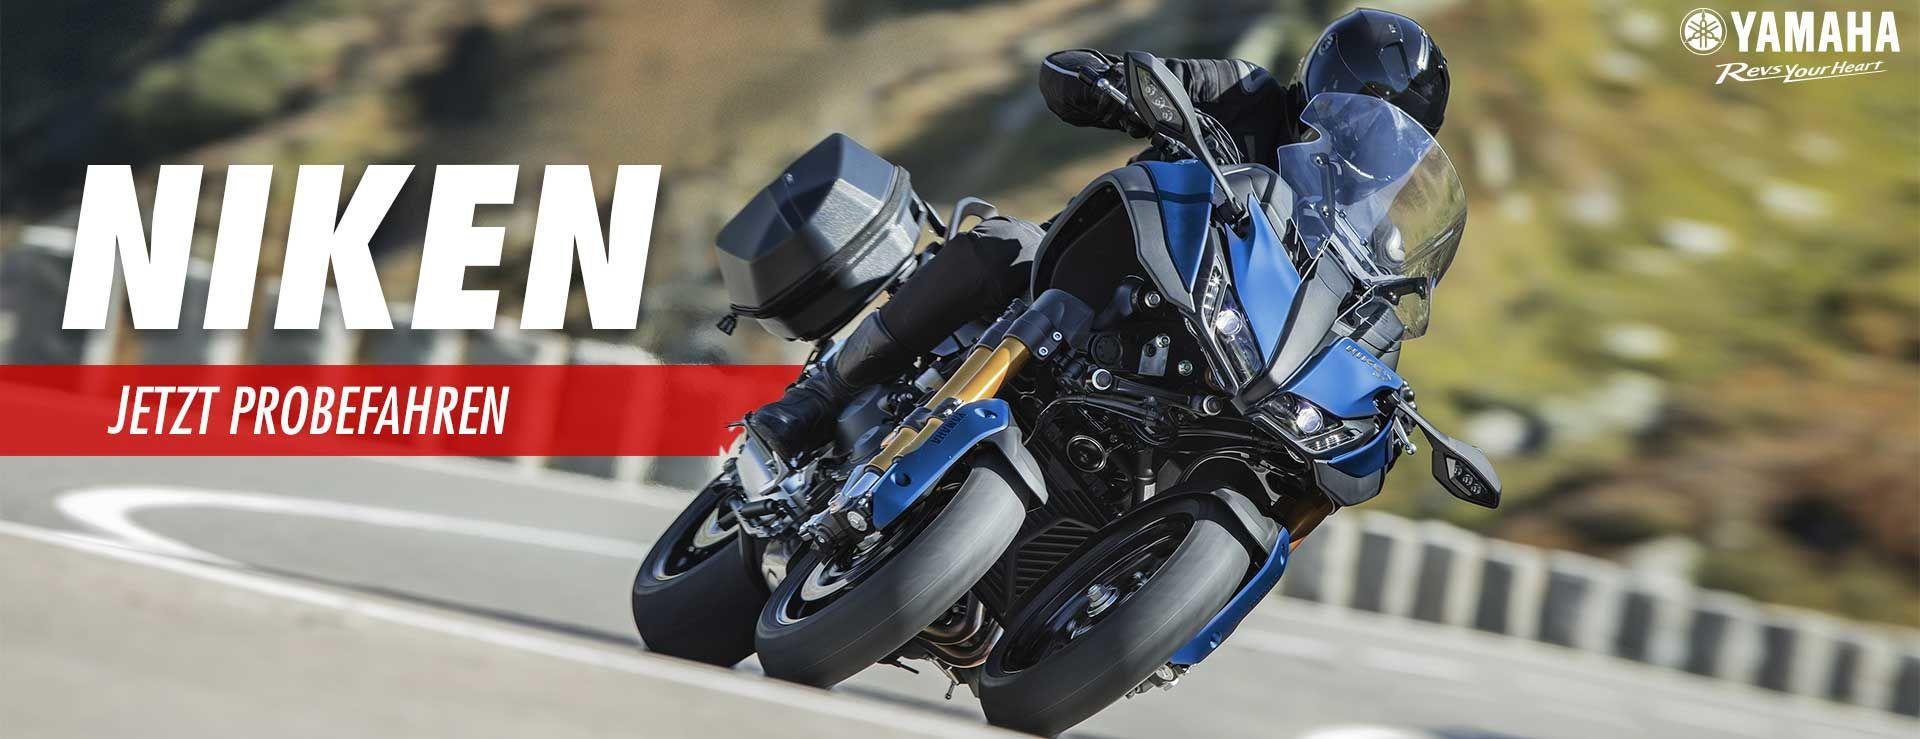 Yamaha Niken Probefahren